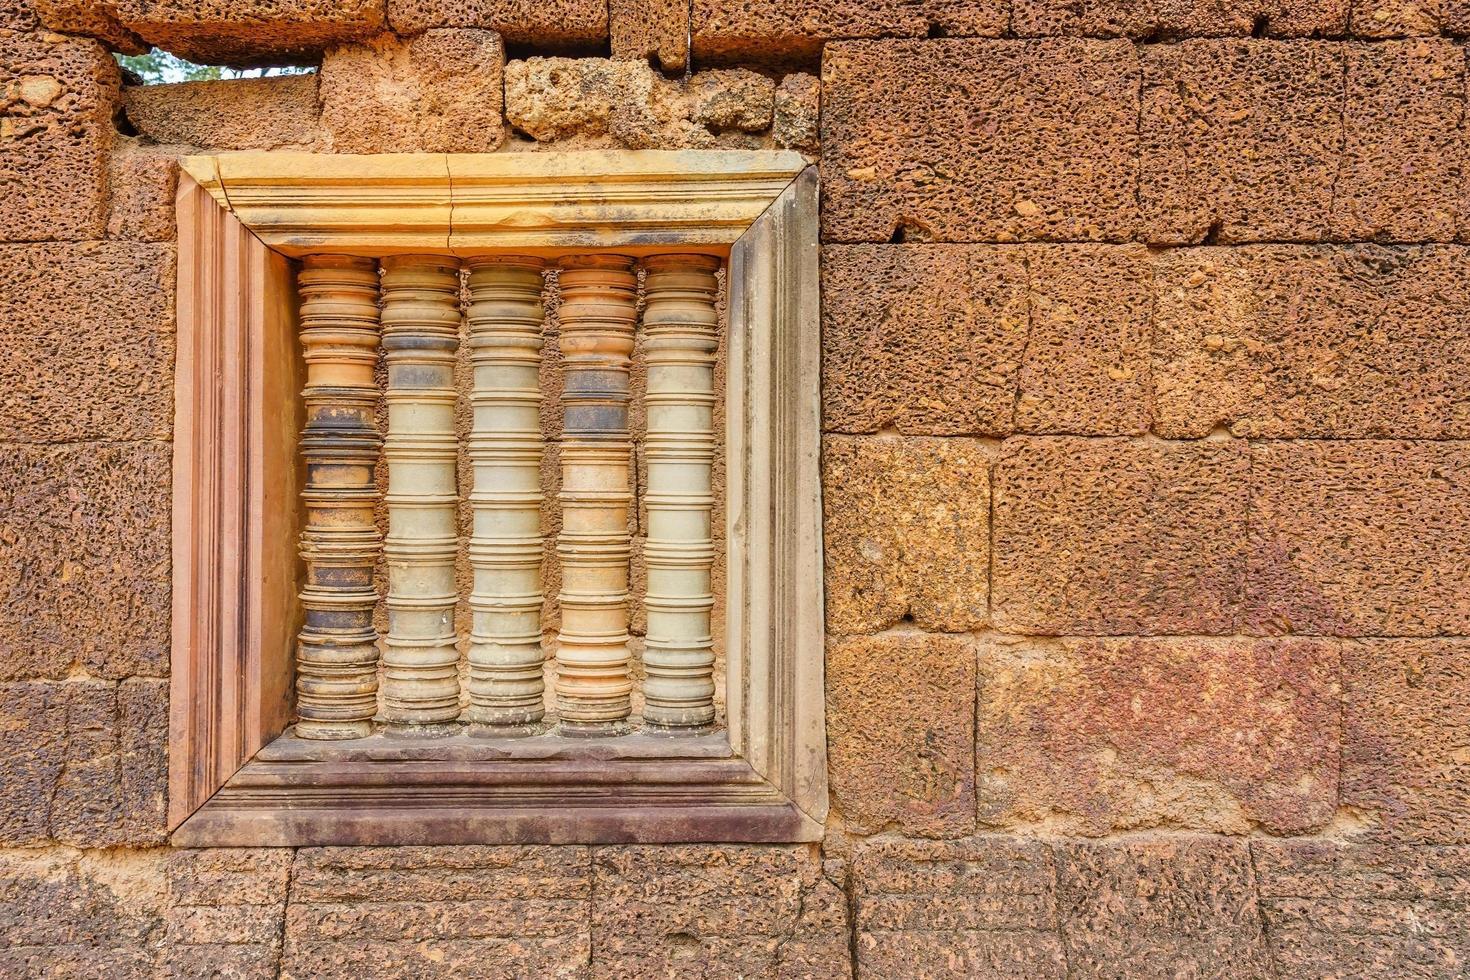 Banteay Srei Tempel, der Shiva gewidmet ist, im Dschungel des Angkor-Gebiets in Kambodscha foto